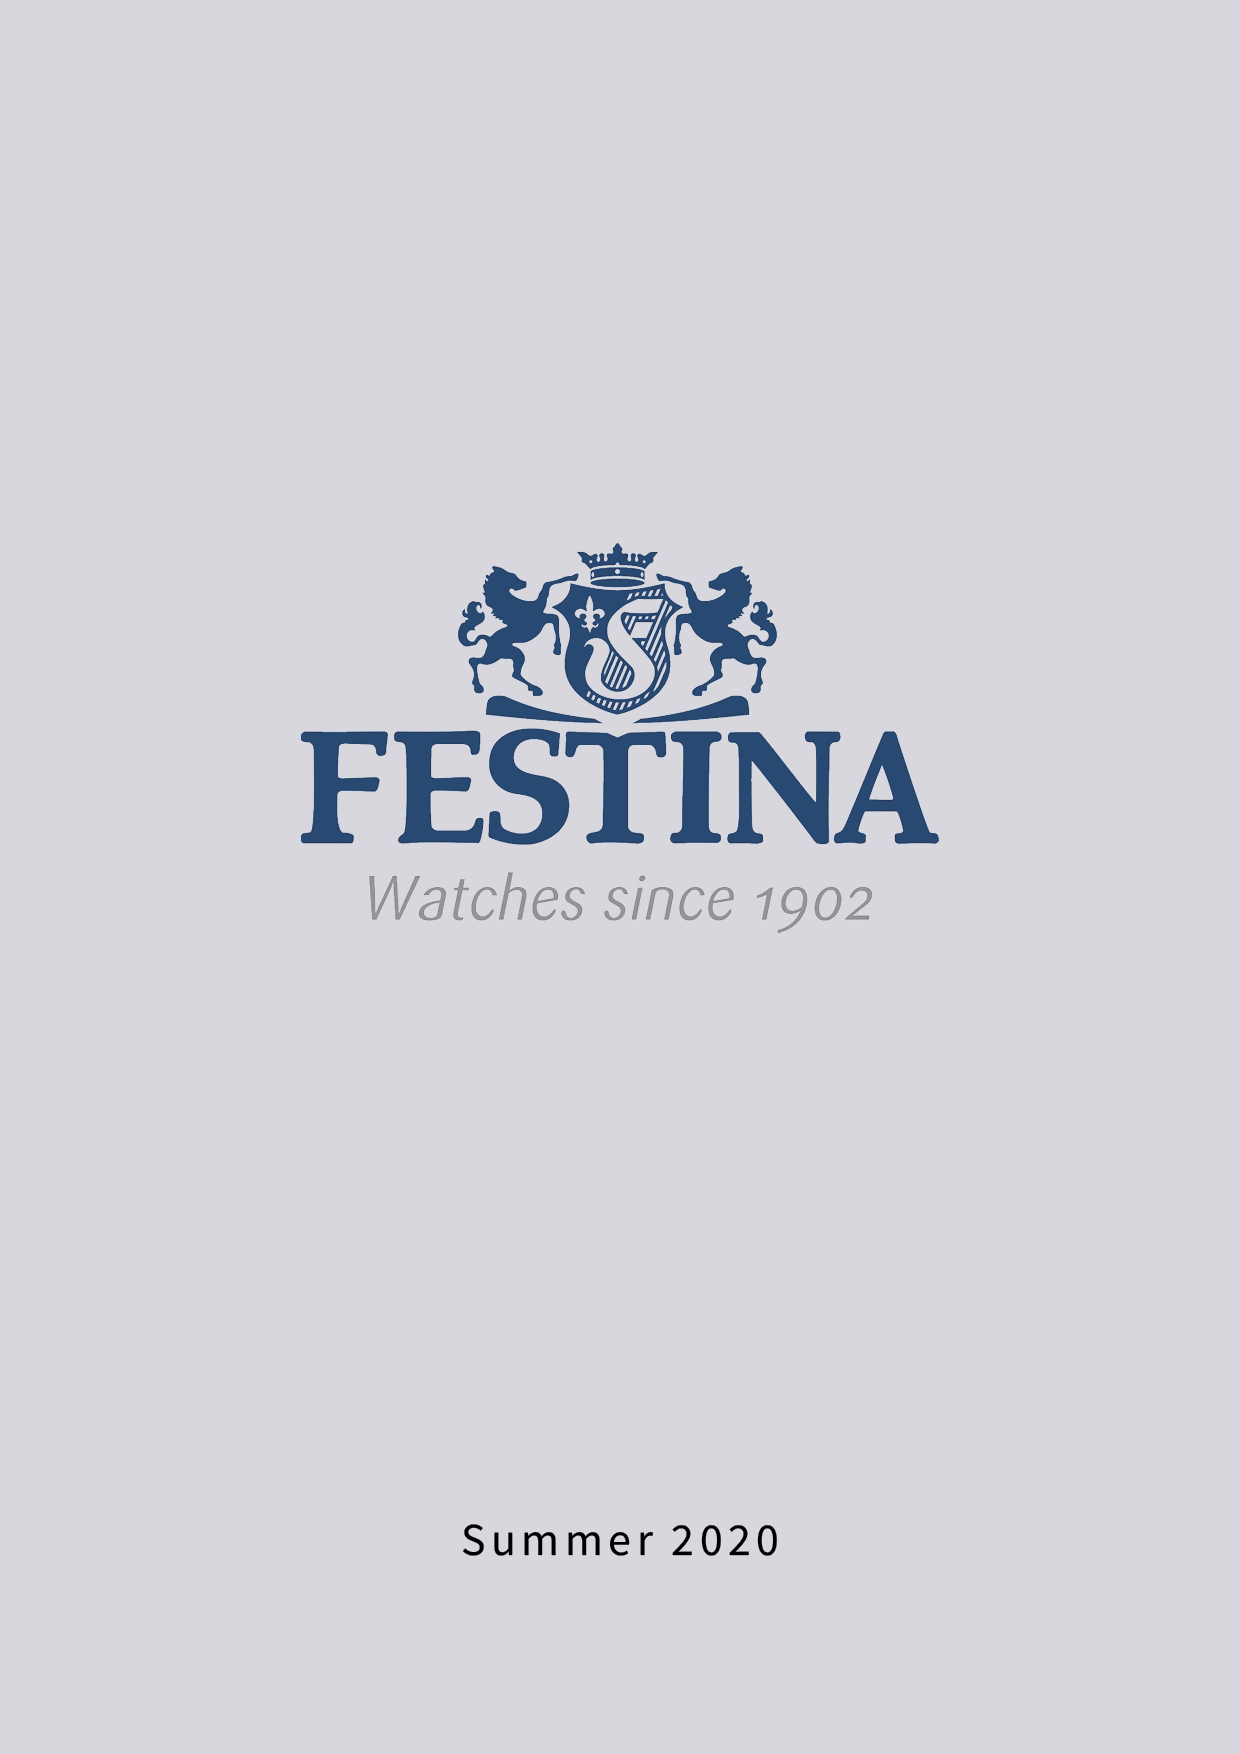 Festina_kansi